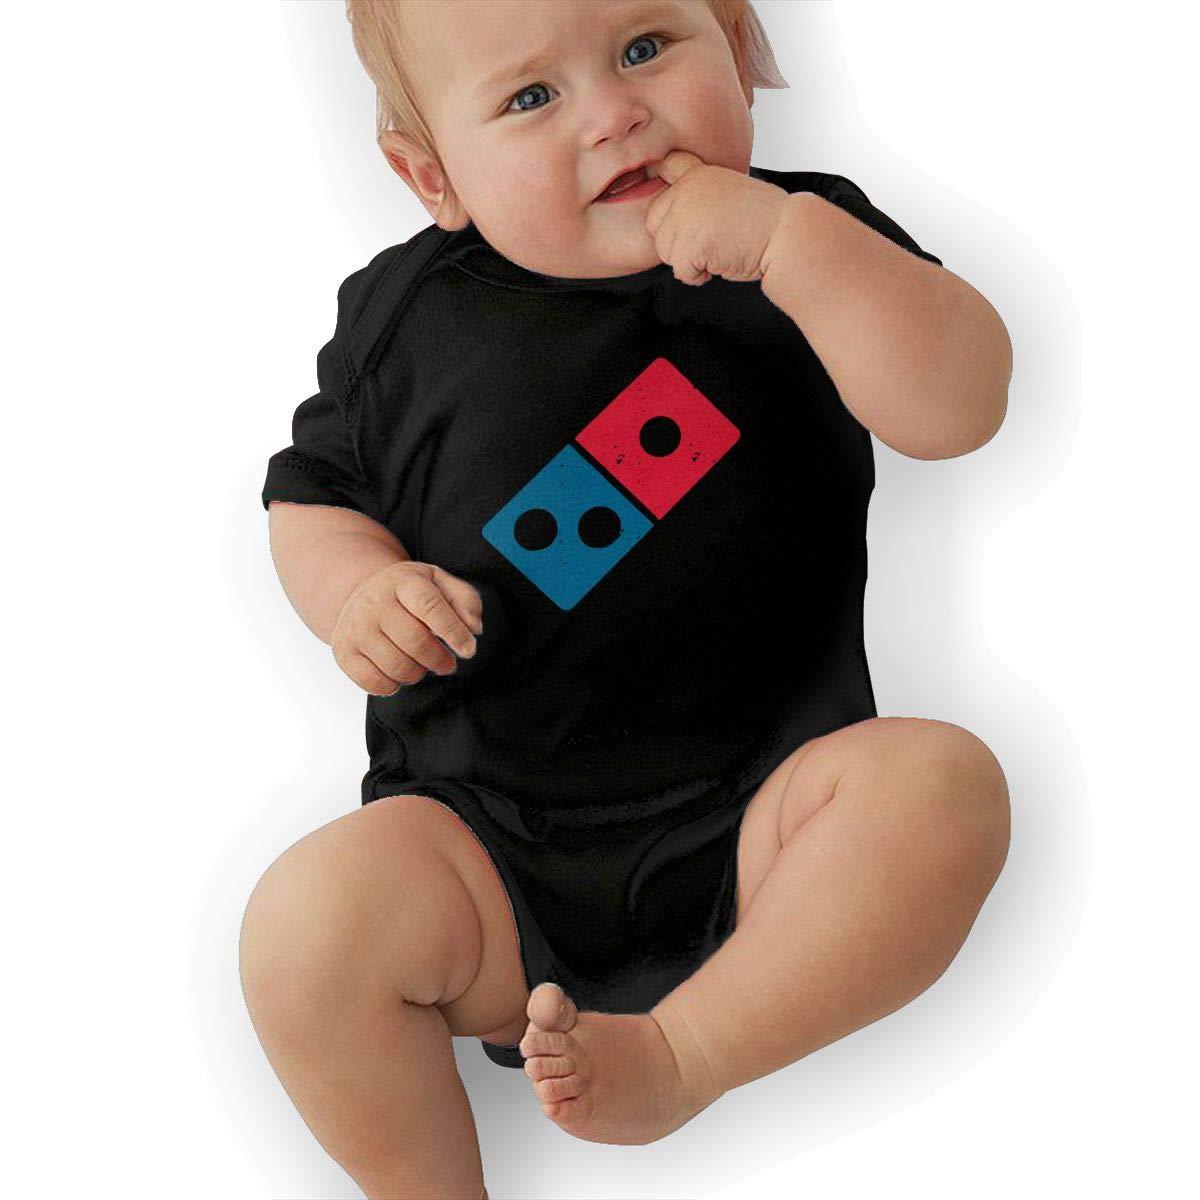 Dfenere I Swear Im A Bear Graphic Newborn Baby Short Sleeve Bodysuit Romper Infant Summer Clothing